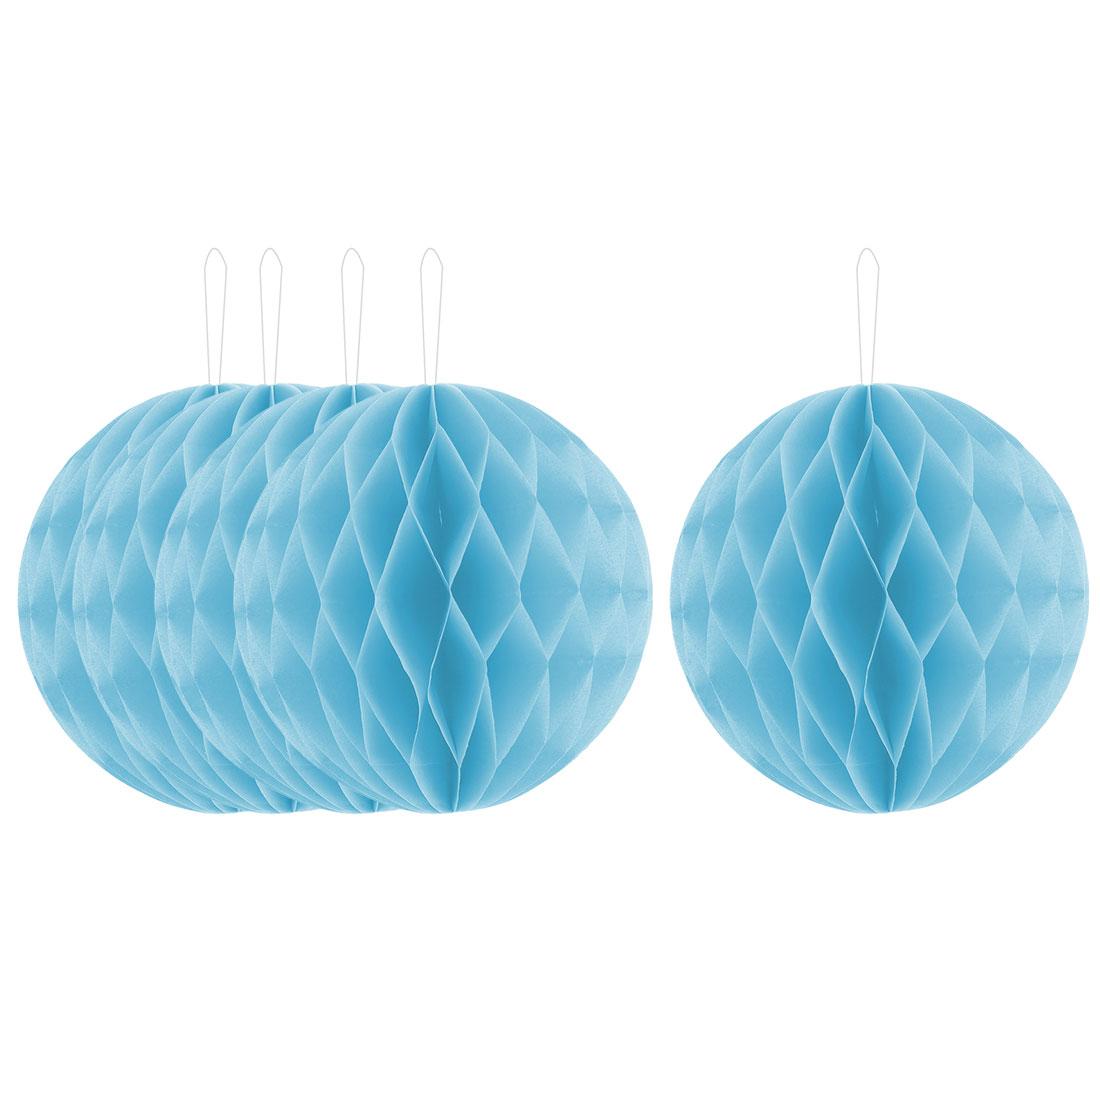 Festival Paper Handmade DIY Hanging Decor Honeycomb Ball Lantern Light Blue 8 Inches 5pcs